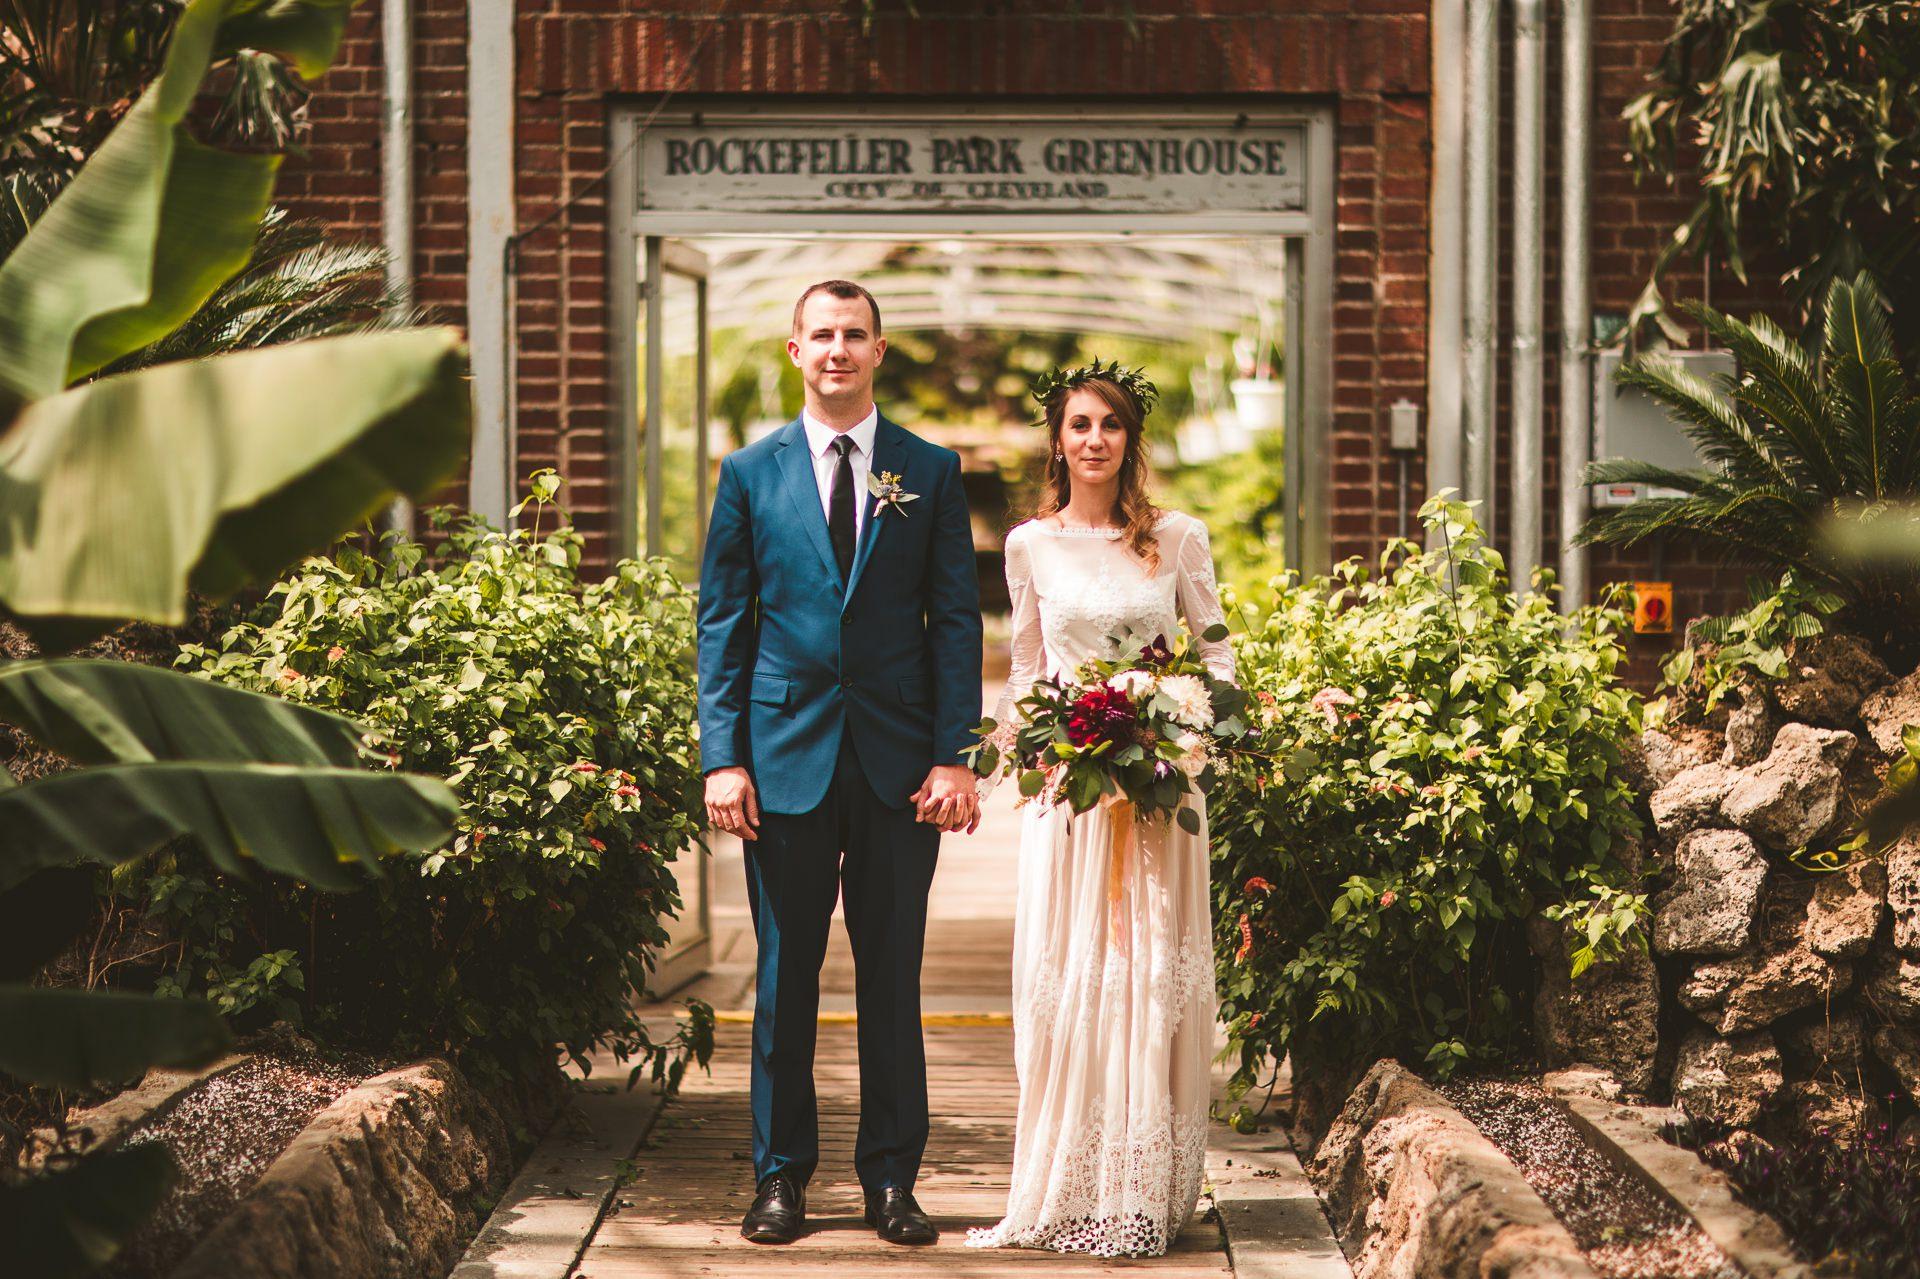 Ariel International Center Wedding Photographer in Cleveland 17.jpg